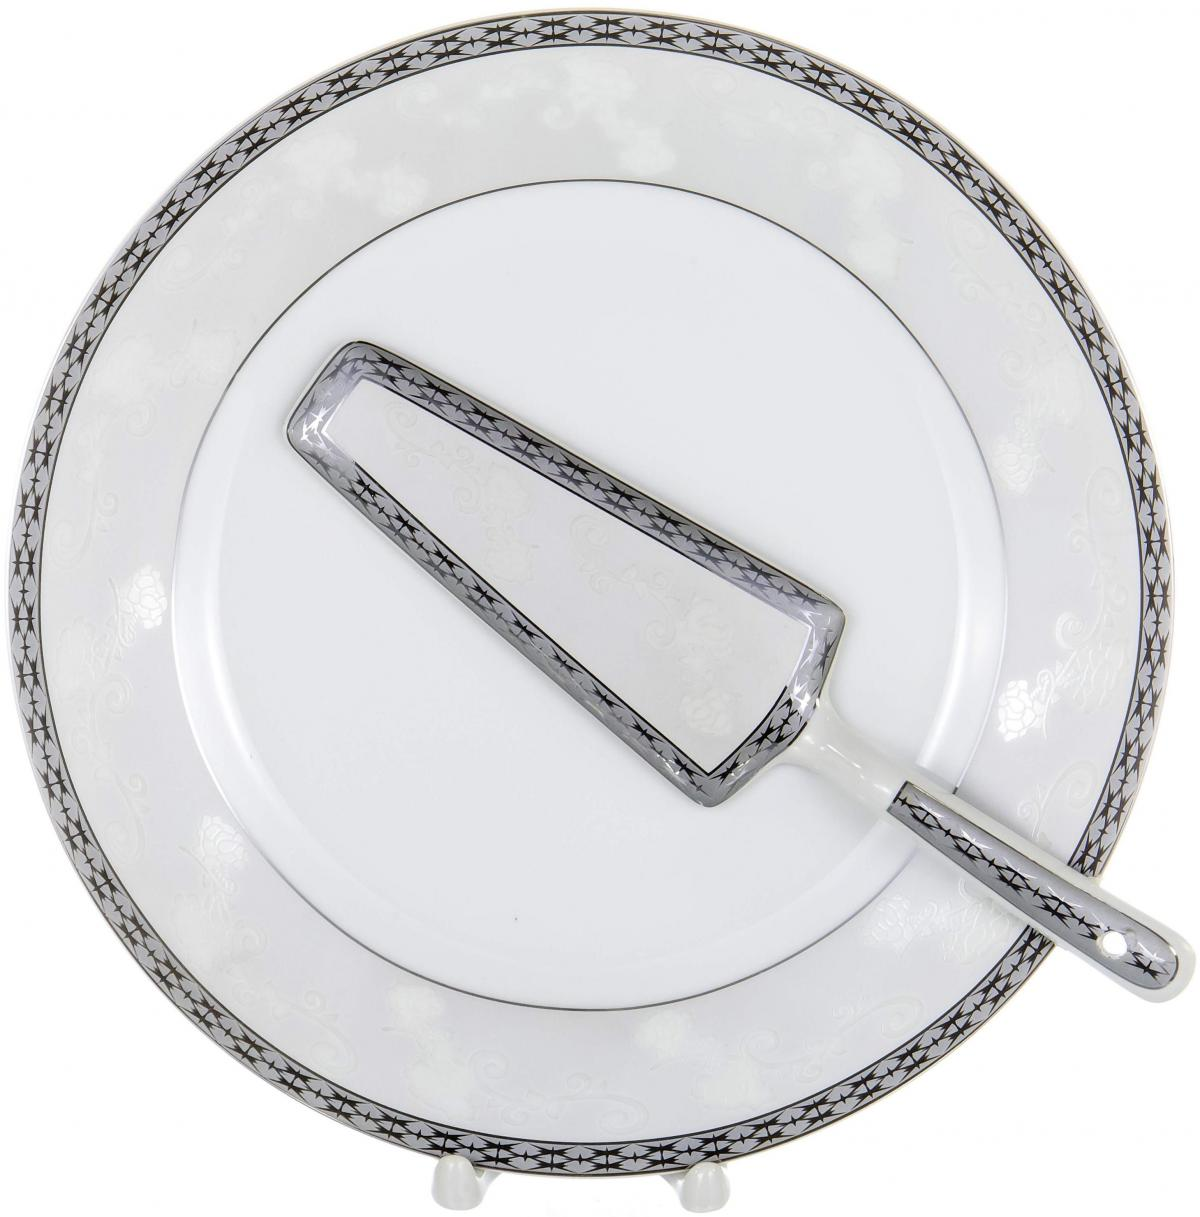 Набор для торта Olaff, 2 предмета. LRS-CPN2-009LRS-CPN2-009CAKE 2, набор д/торта (2) блюдо 255мм + лопатка, декор - золото-серебро, подарочная упаковка